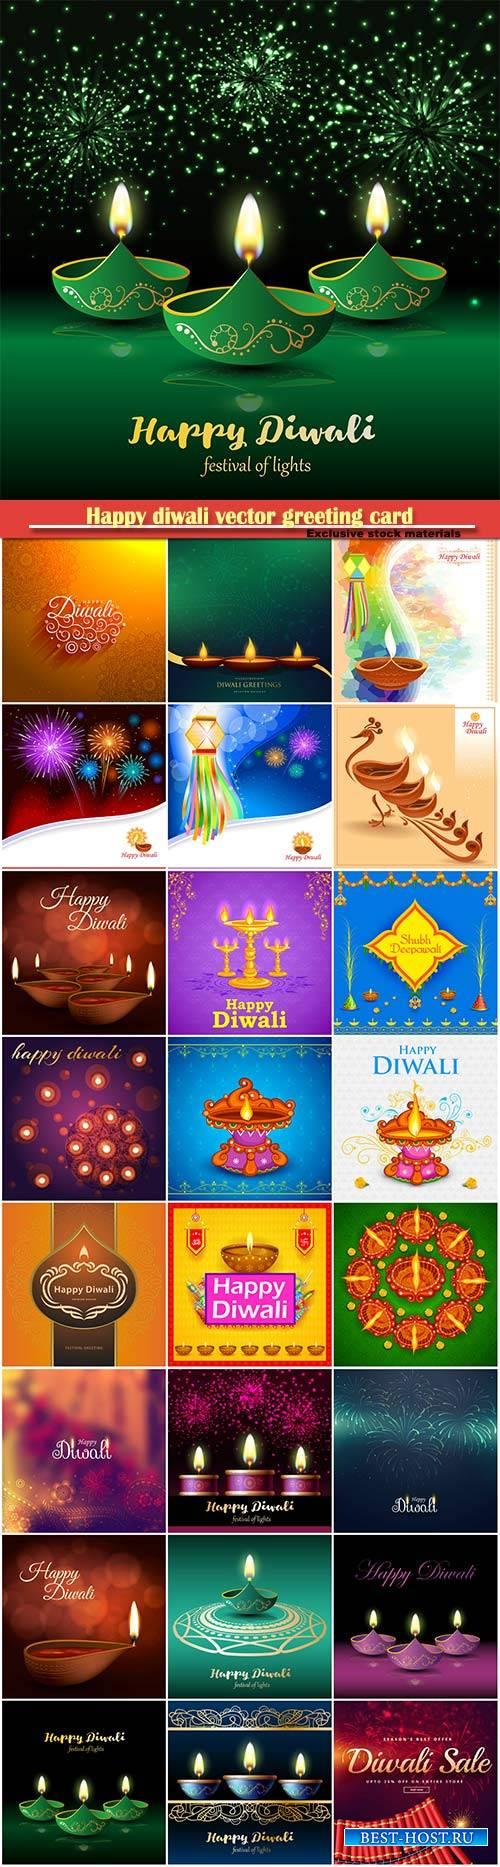 Happy diwali vector greeting card # 6